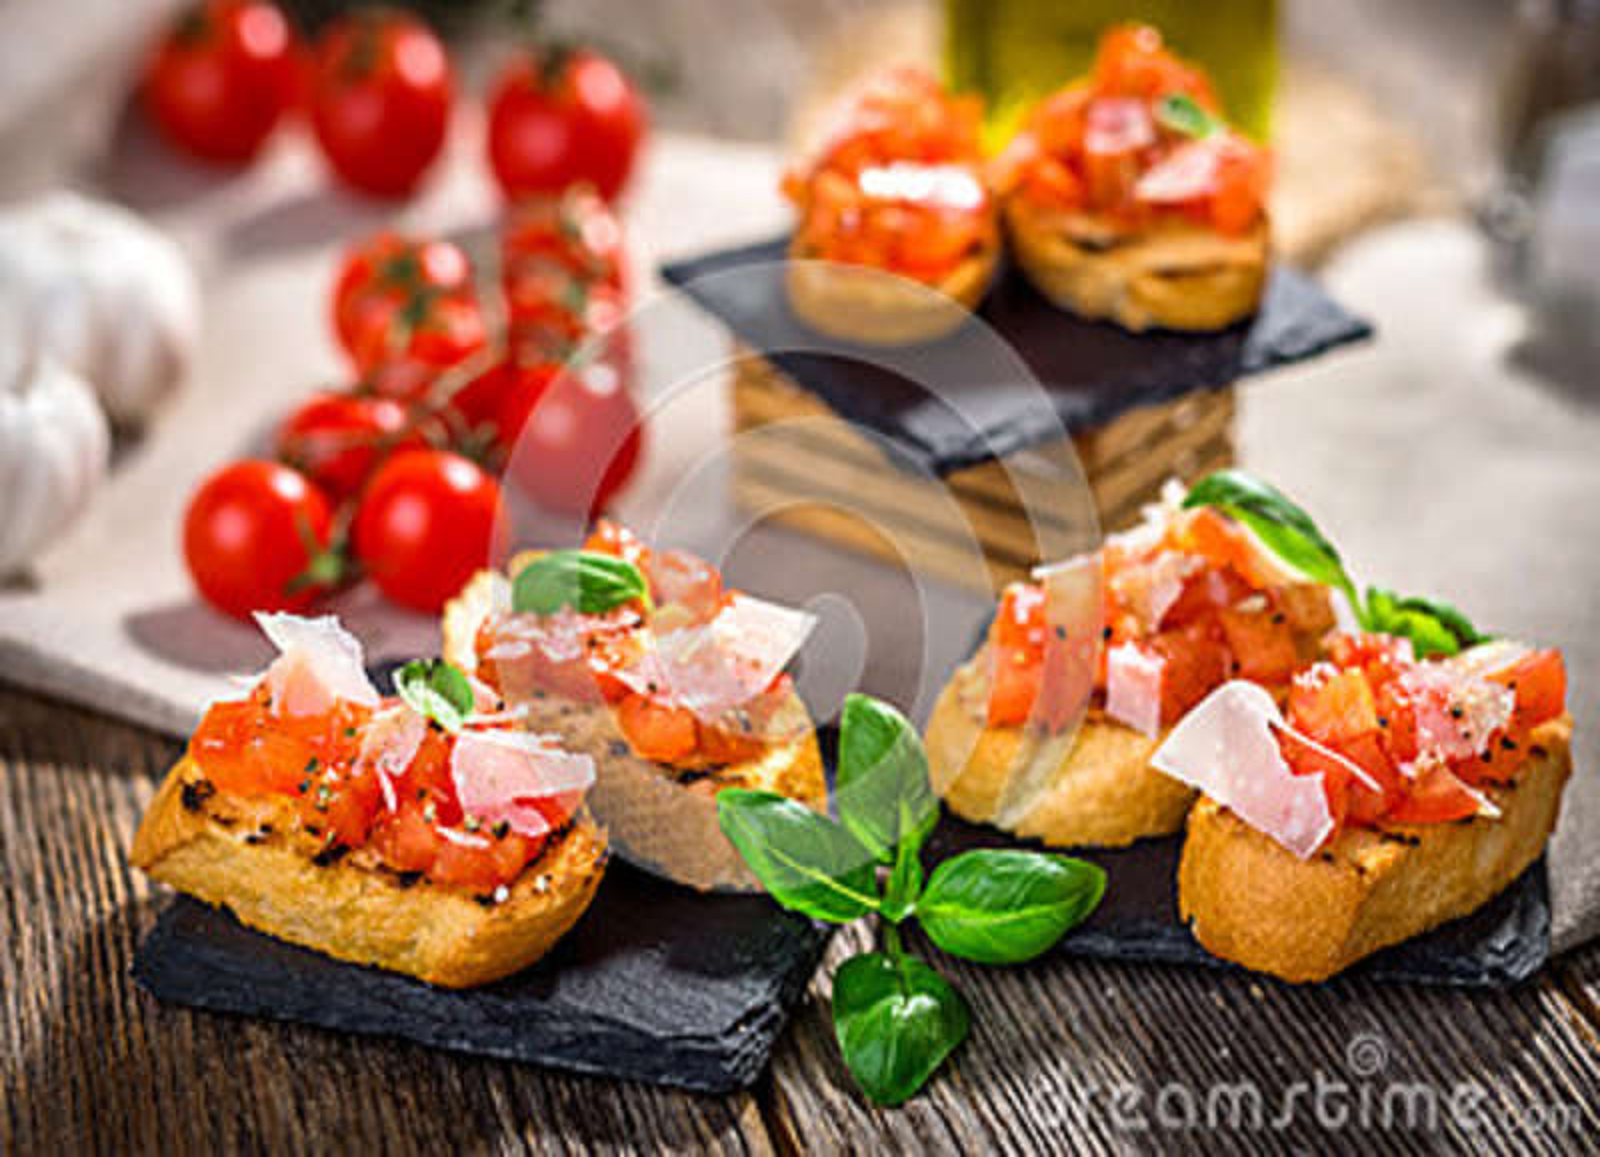 Smakowity bruschetta z pomidorem, basil, parmesan, oliwa z oliwek